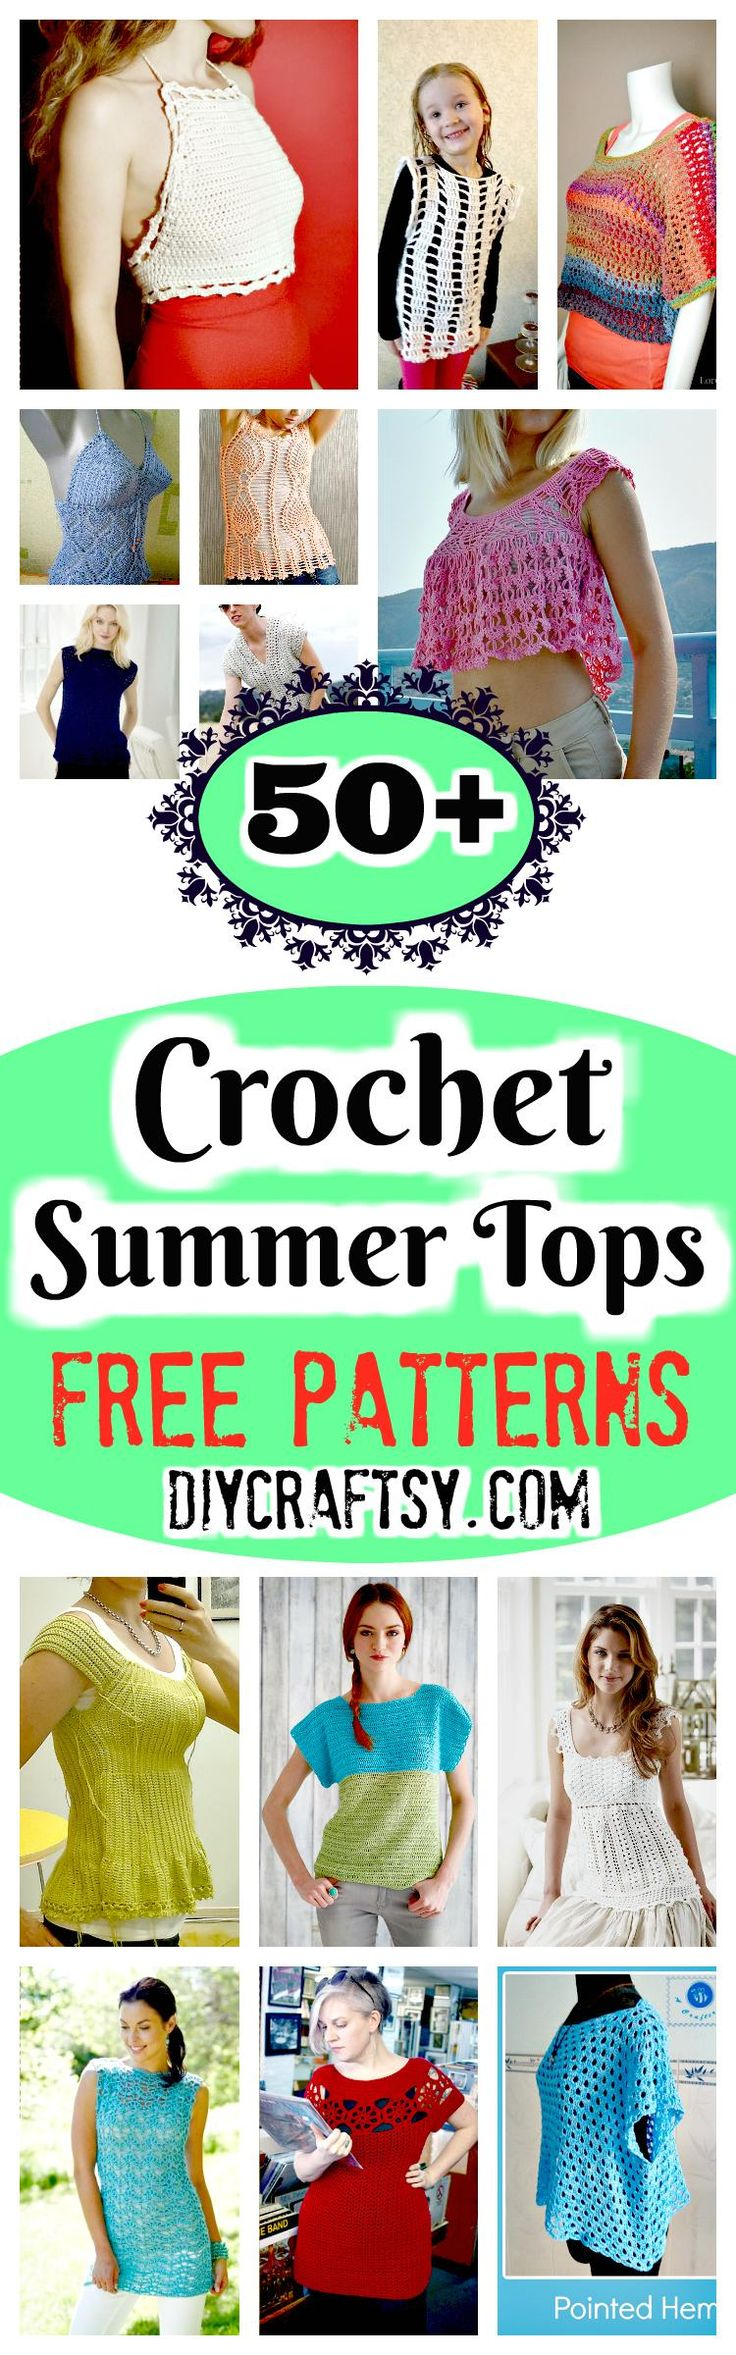 50+ Quick & Easy Crochet Summer Tops – Free Patterns